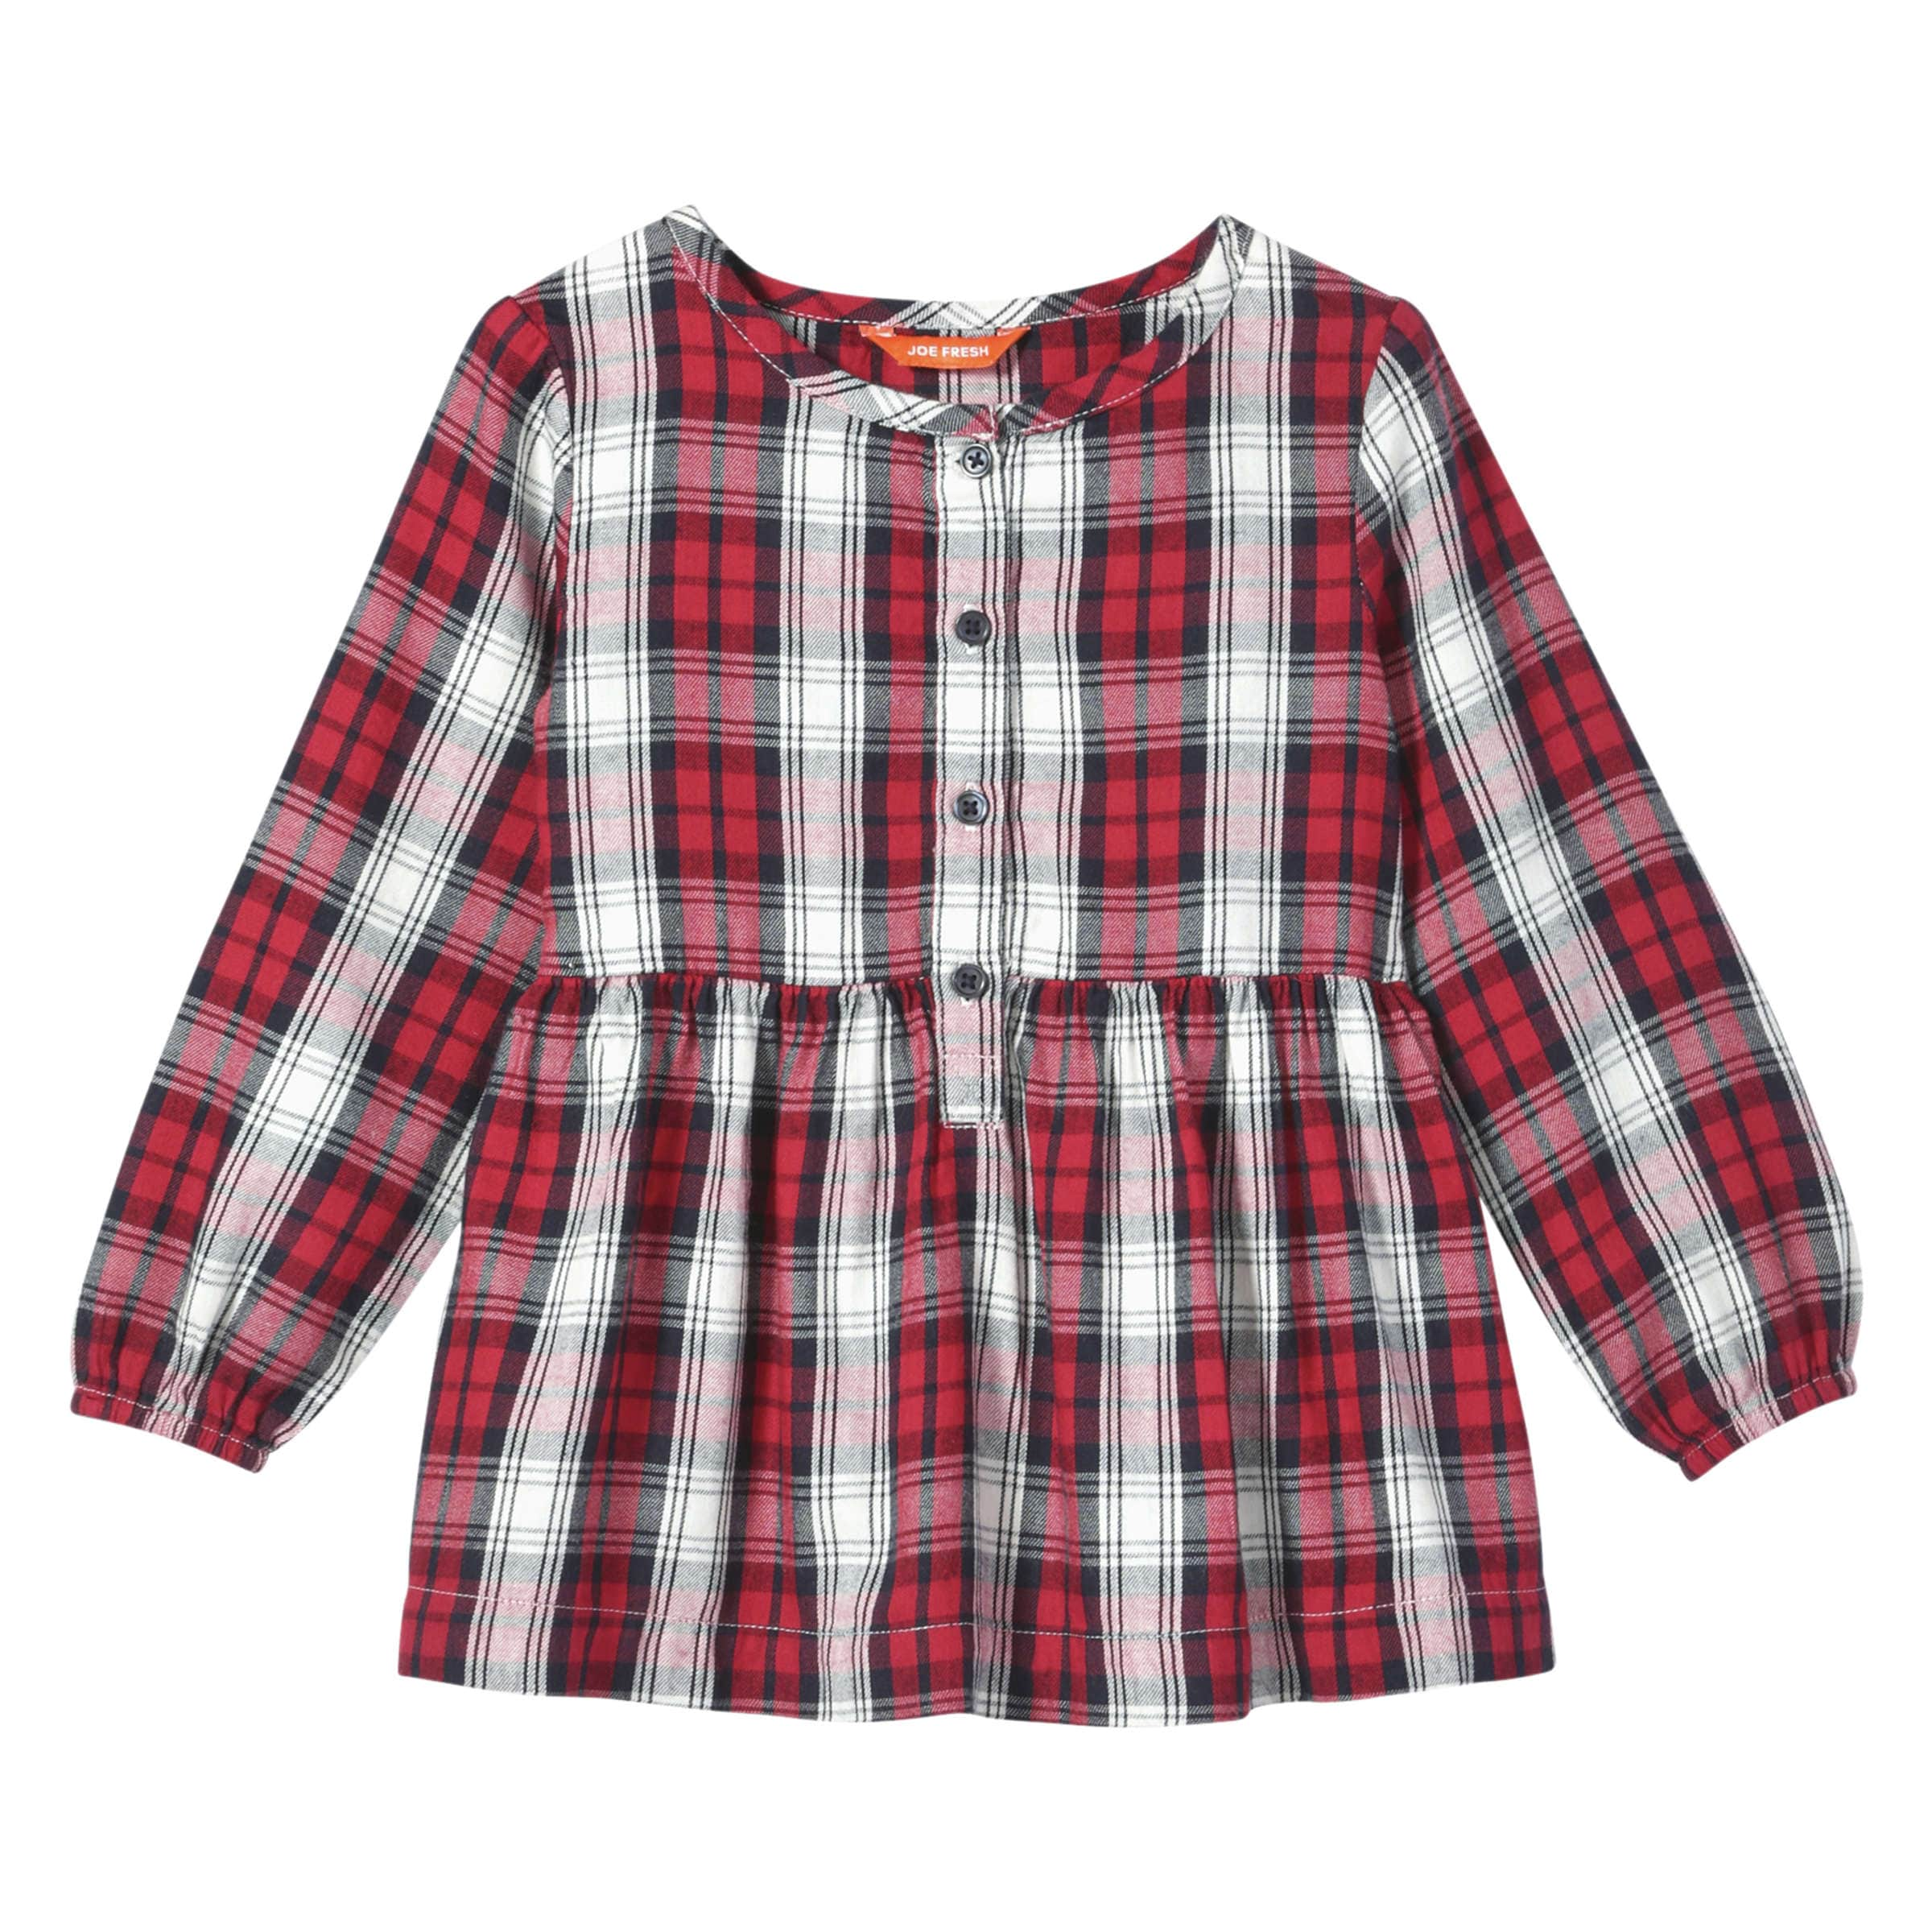 3d05dd37 Toddler Girls' Flannel Shirt in Carmine Red from Joe Fresh